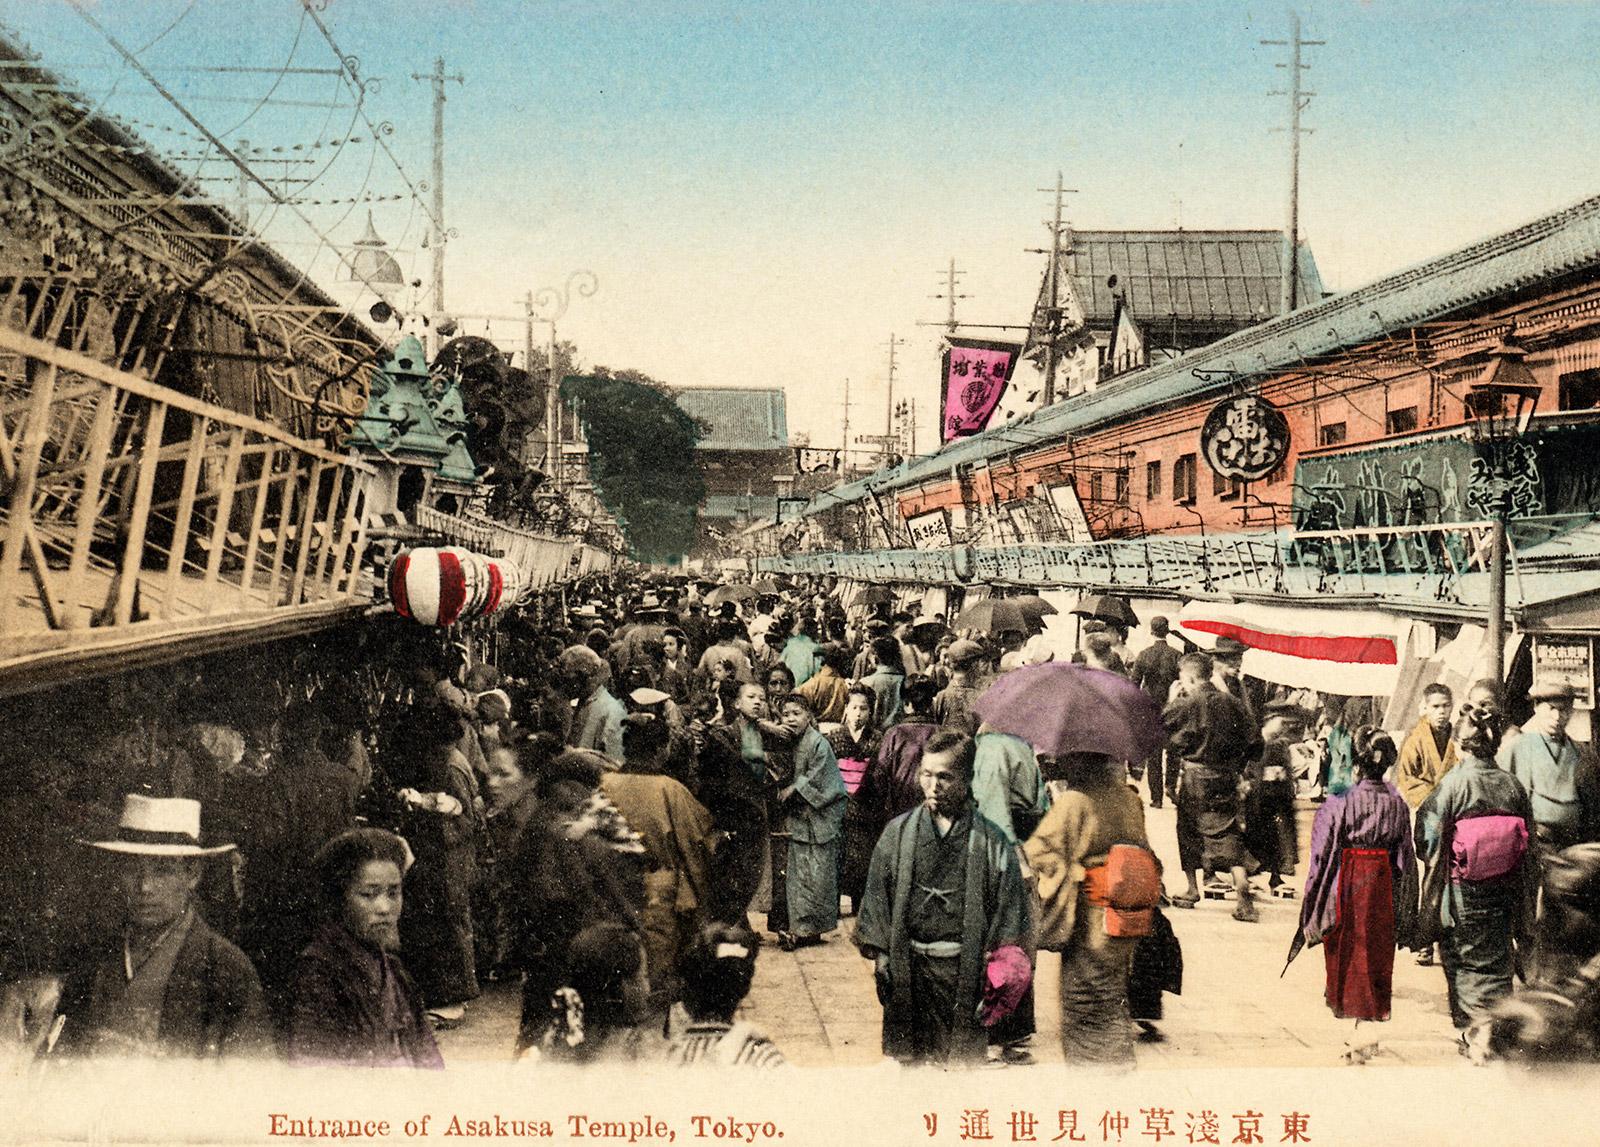 Nakamise-dori leading to the Senso-ji temple, Tokyo, 1900s